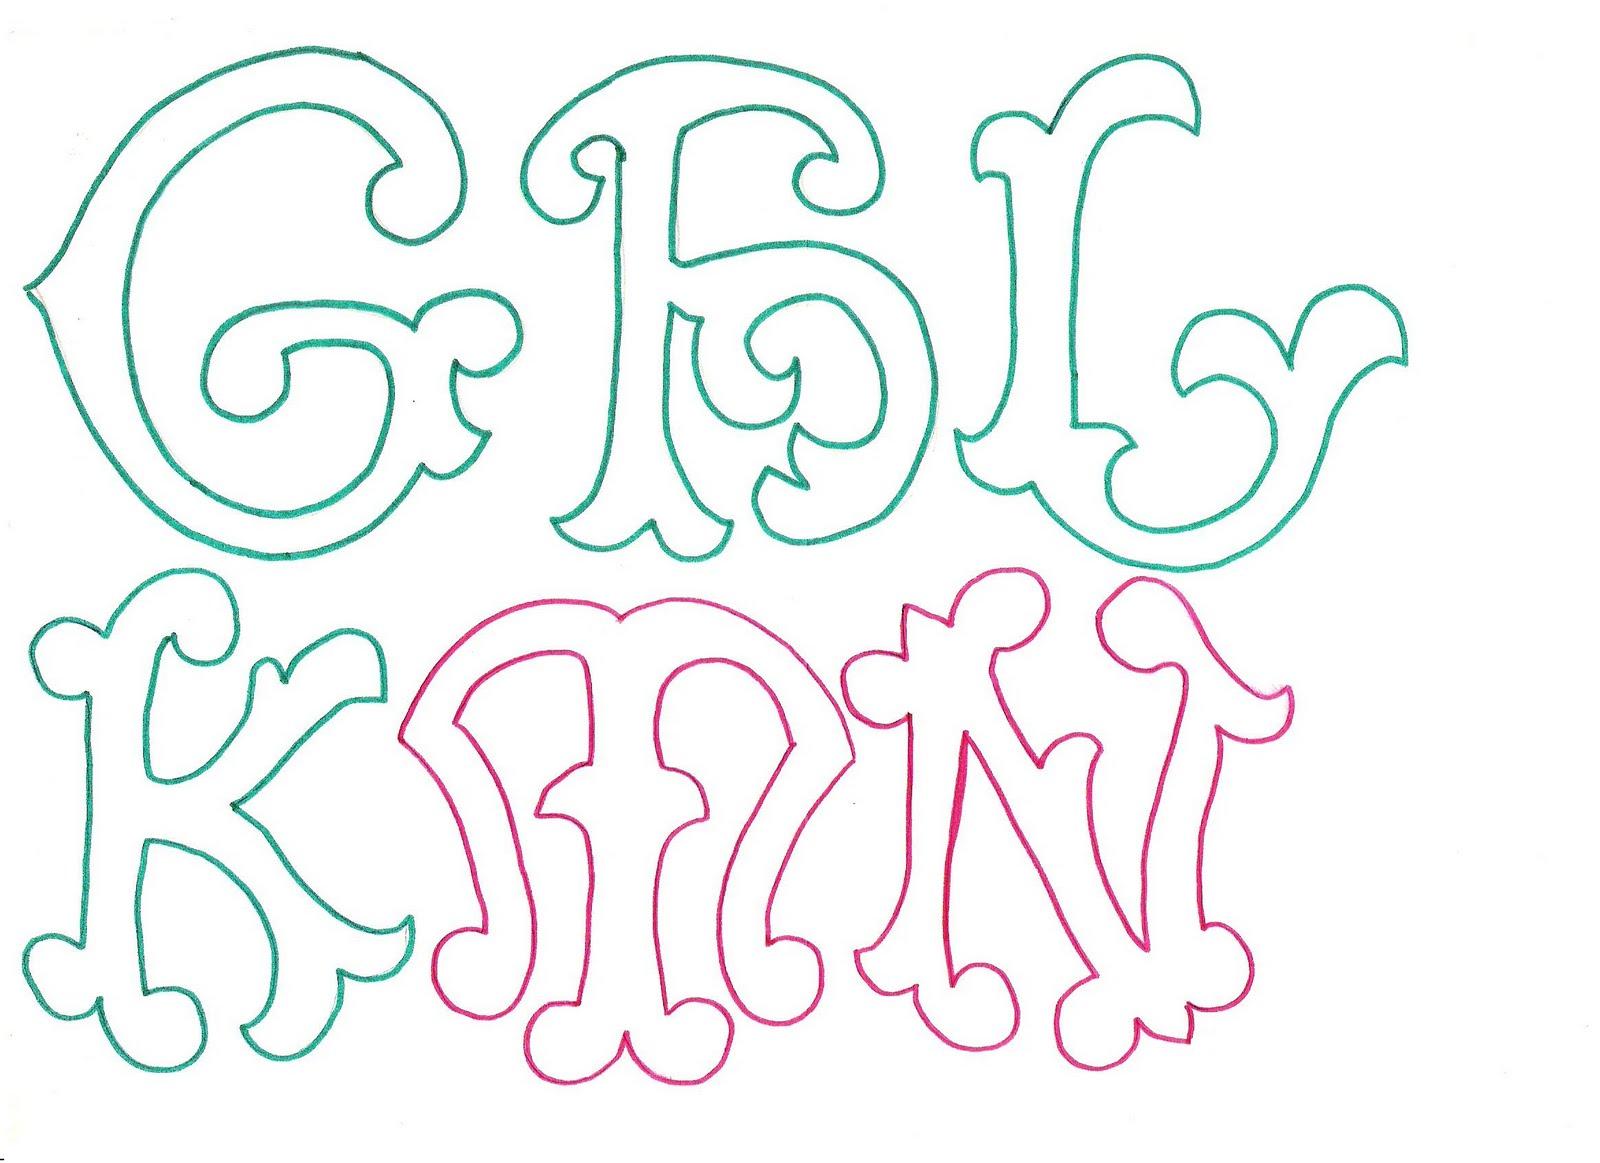 Maestroscomot letras curvas - Literas bonitas ...